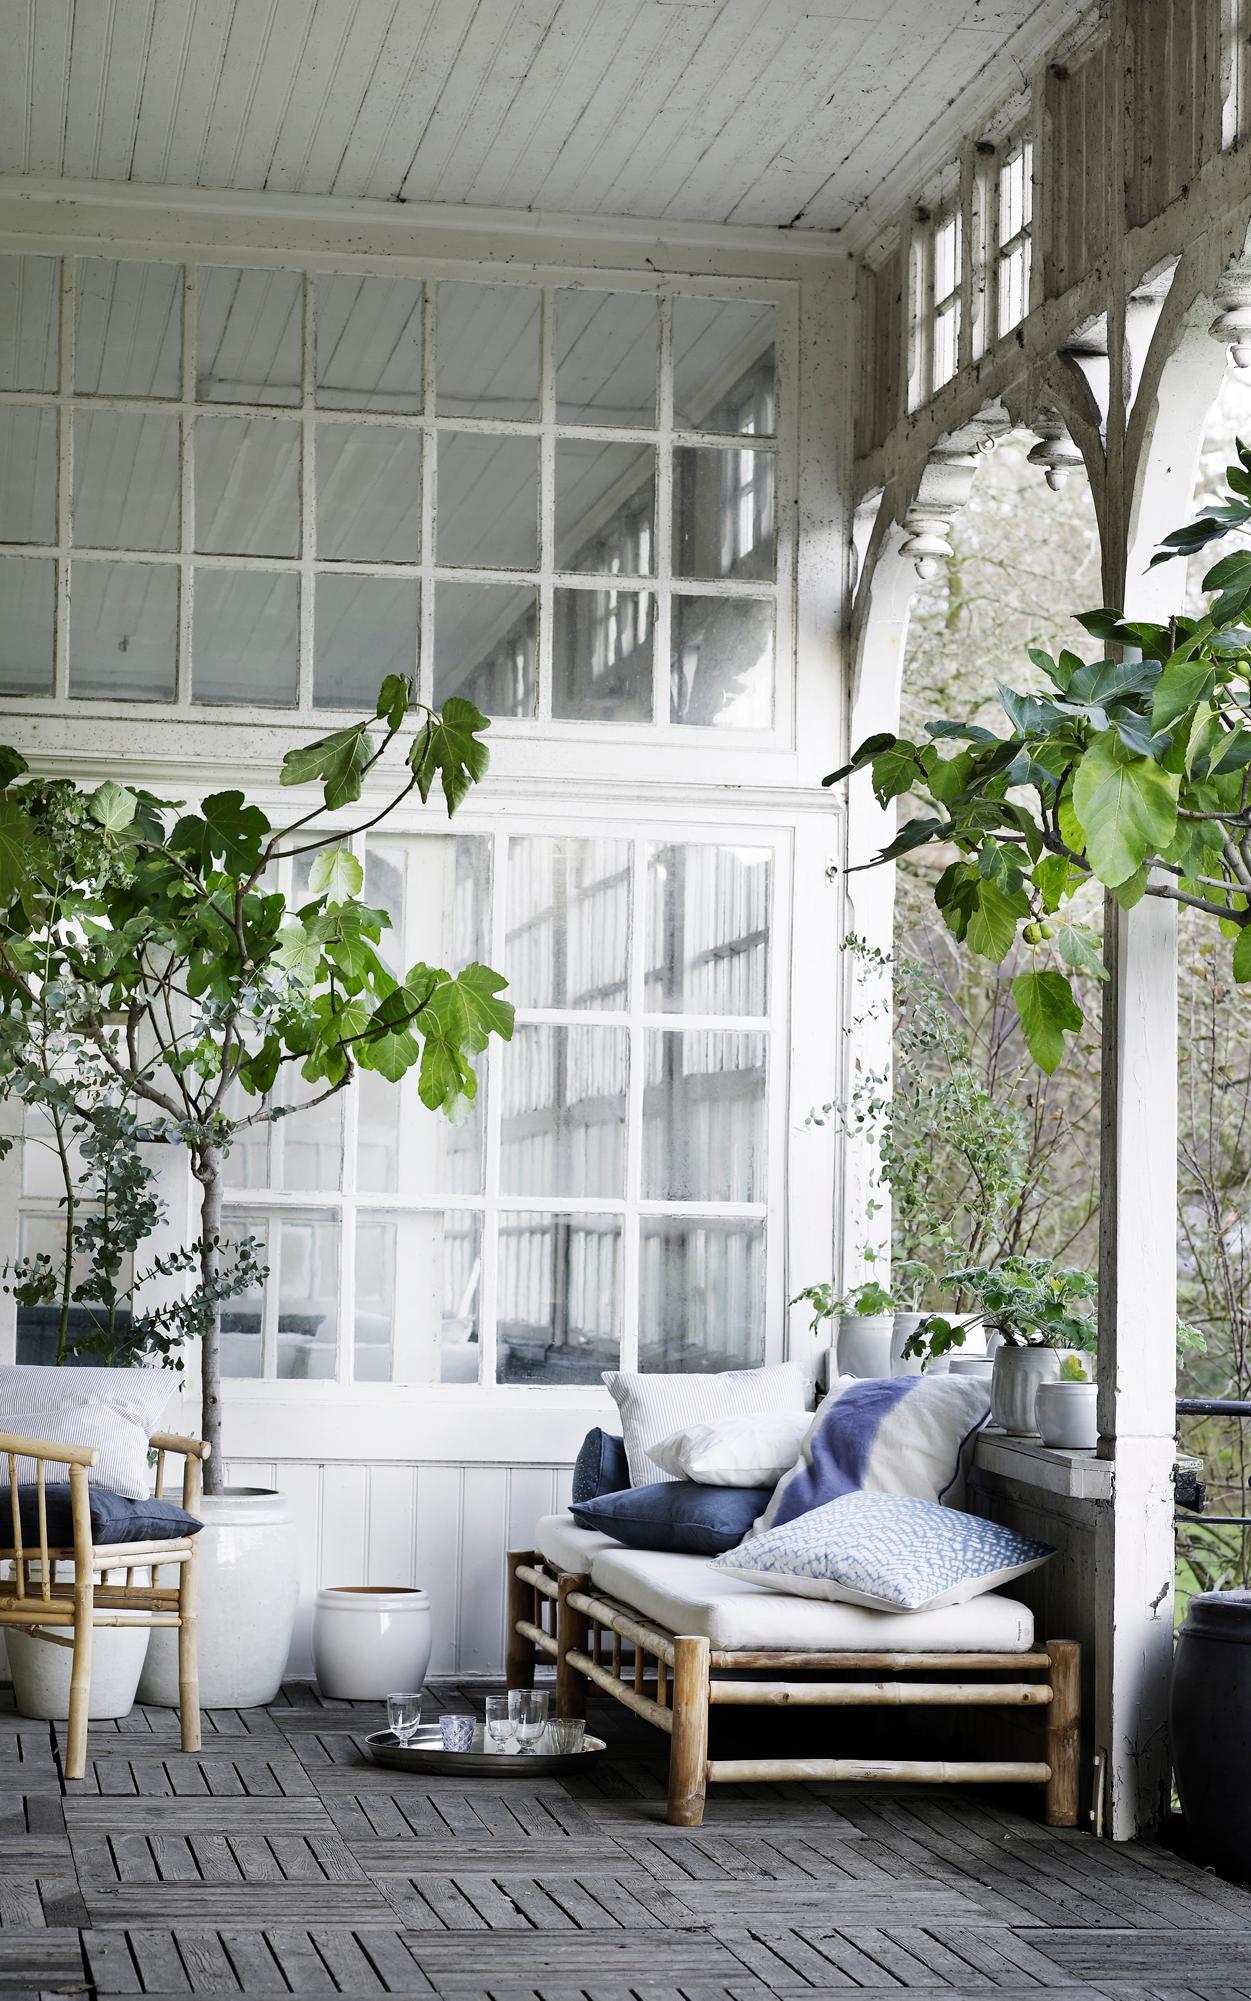 veranda bilder ideen couchstyle. Black Bedroom Furniture Sets. Home Design Ideas